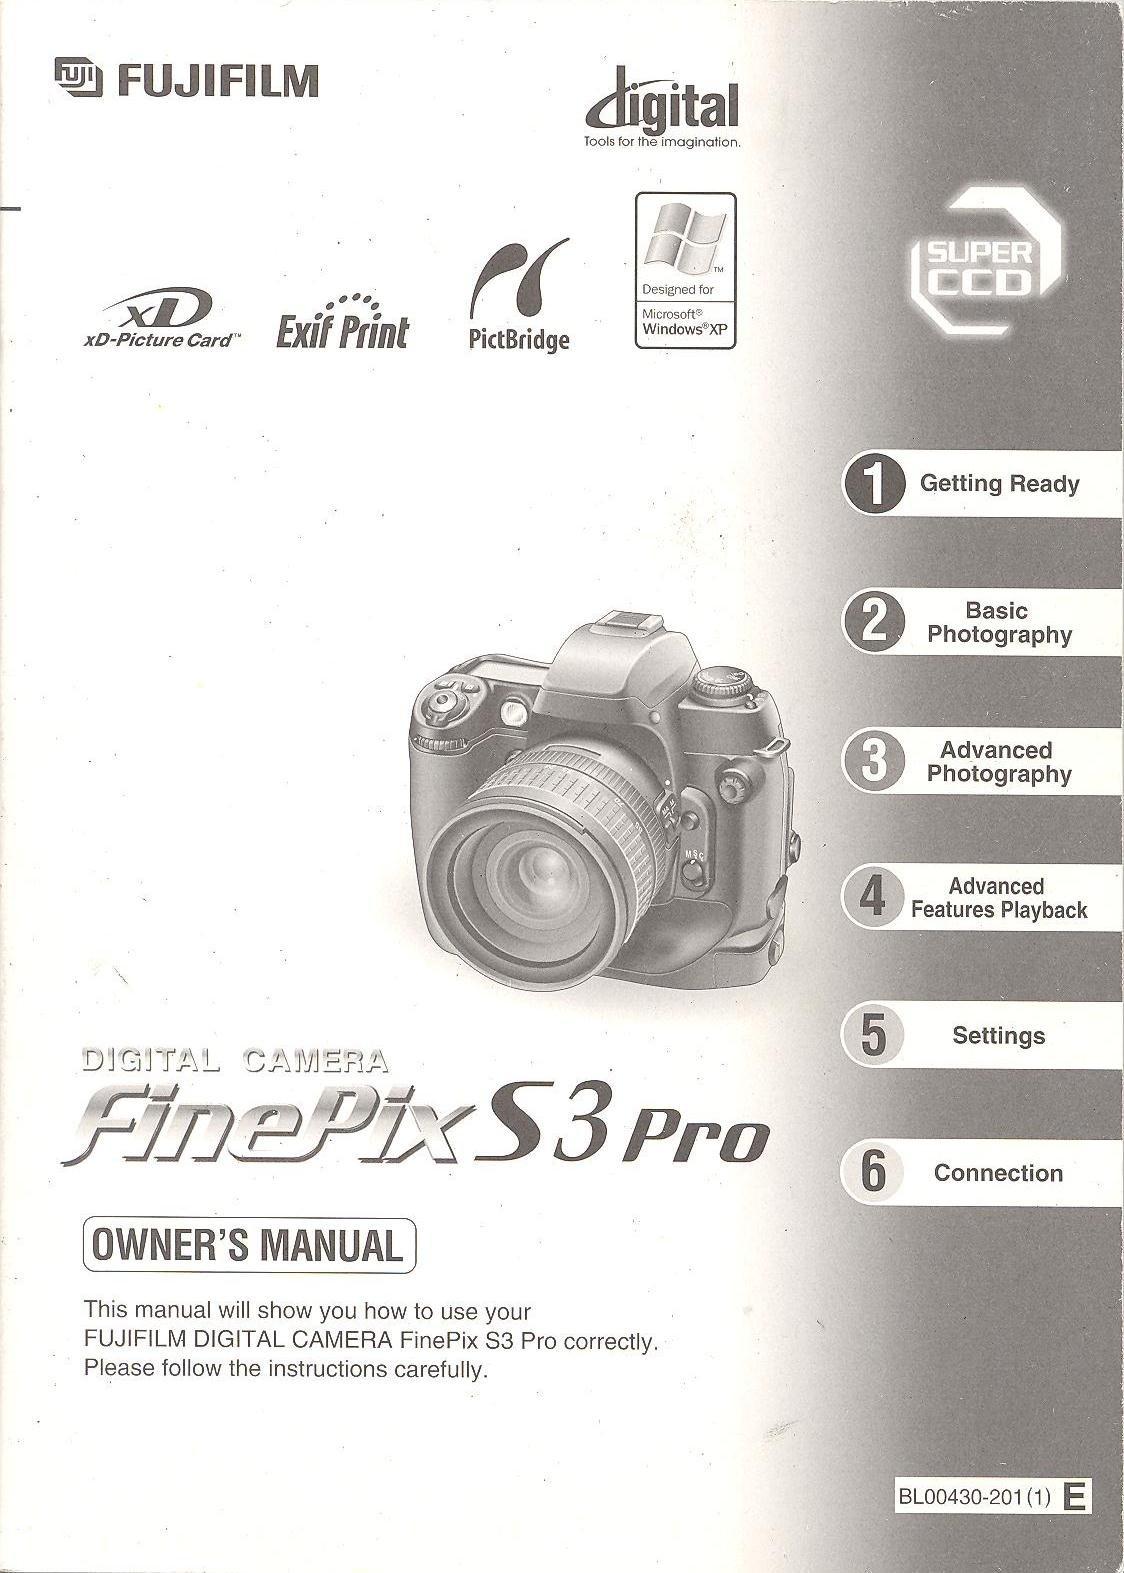 Fujifilm finepix s3 pro digital camera quick start instruction.